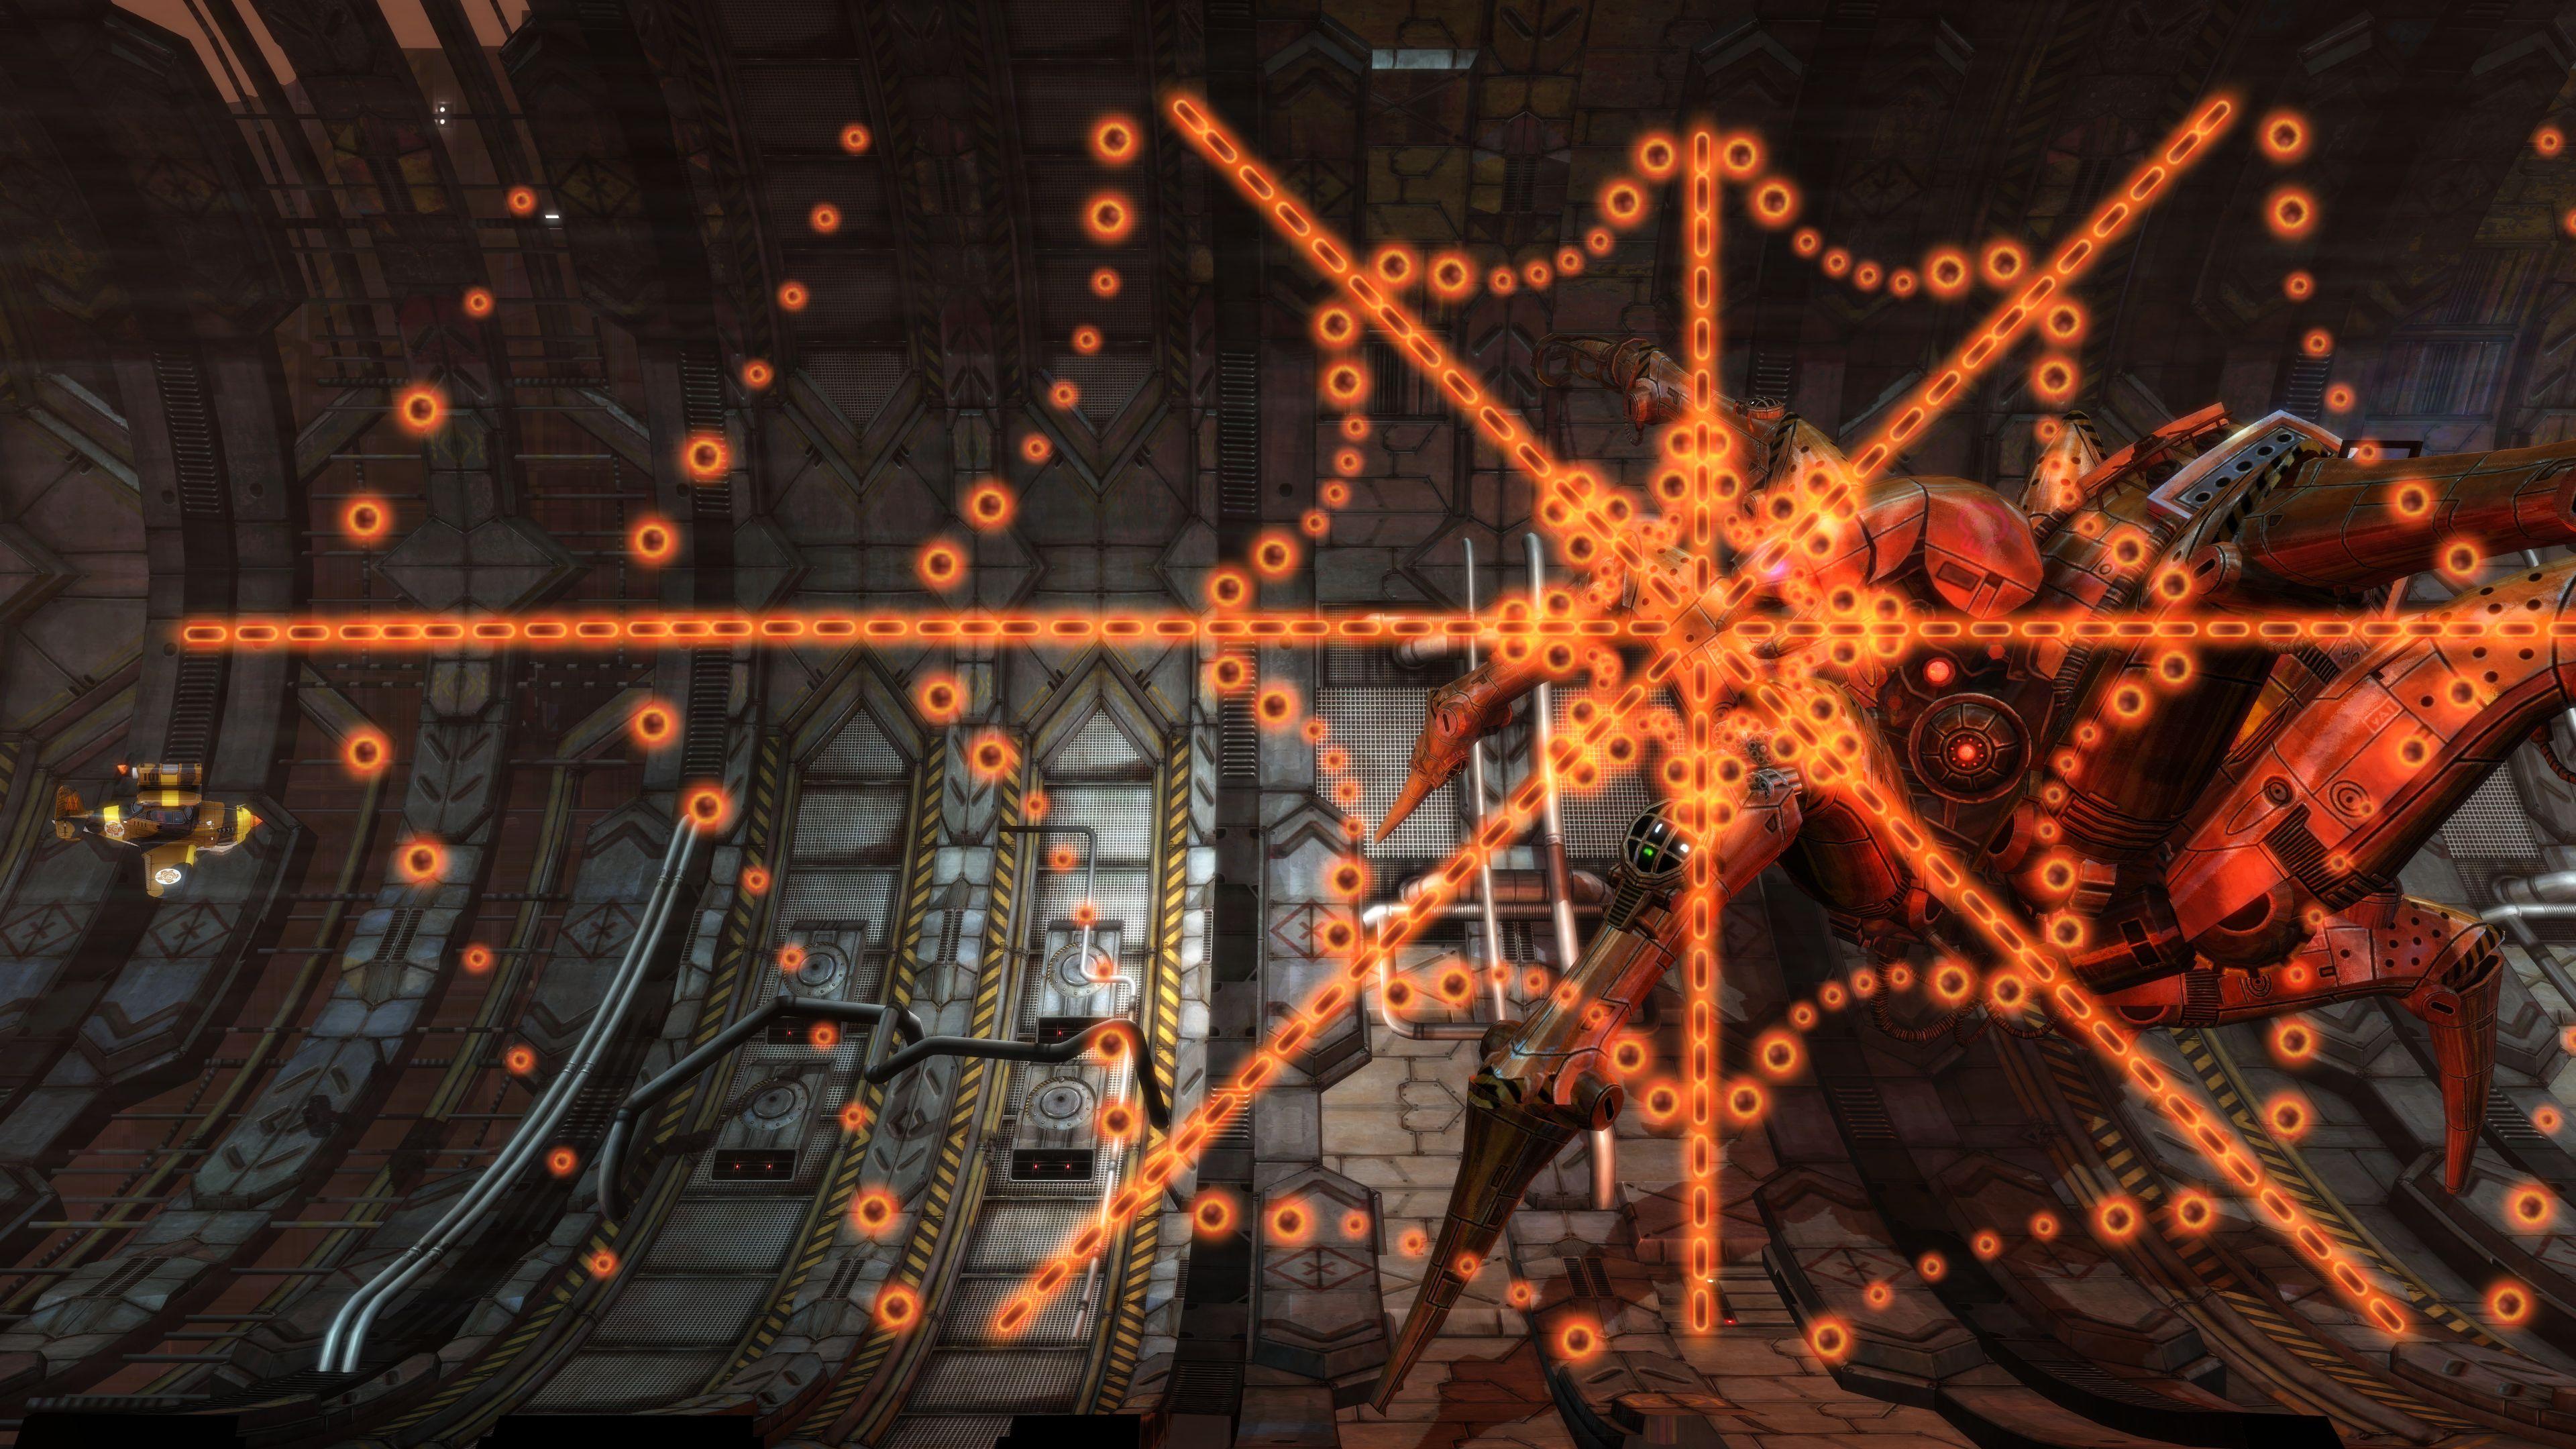 Hry pro Switch se rozrostou o Battle Chasers: Nightwar a Sine Mora EX 142165